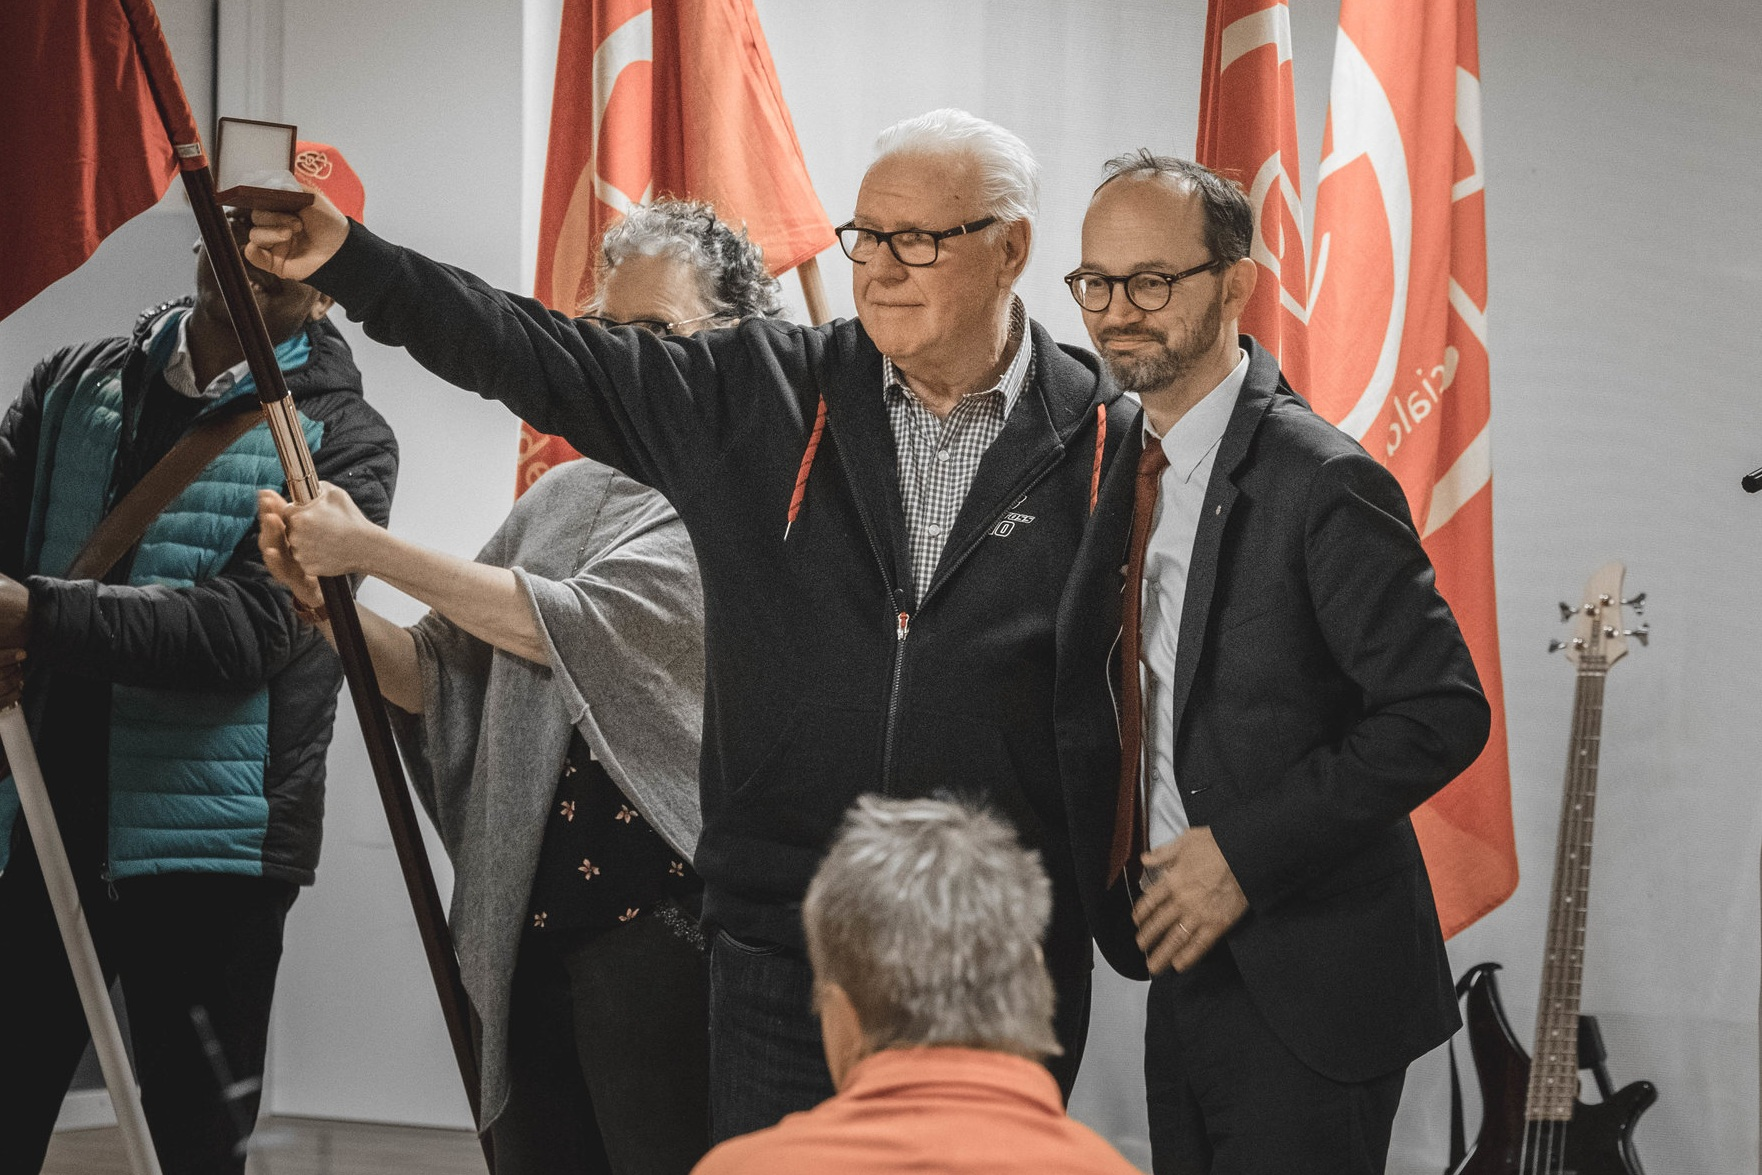 Lennart Åhlén mottar Brantingpriset av infrastrukturminister Tomas Eneroth.